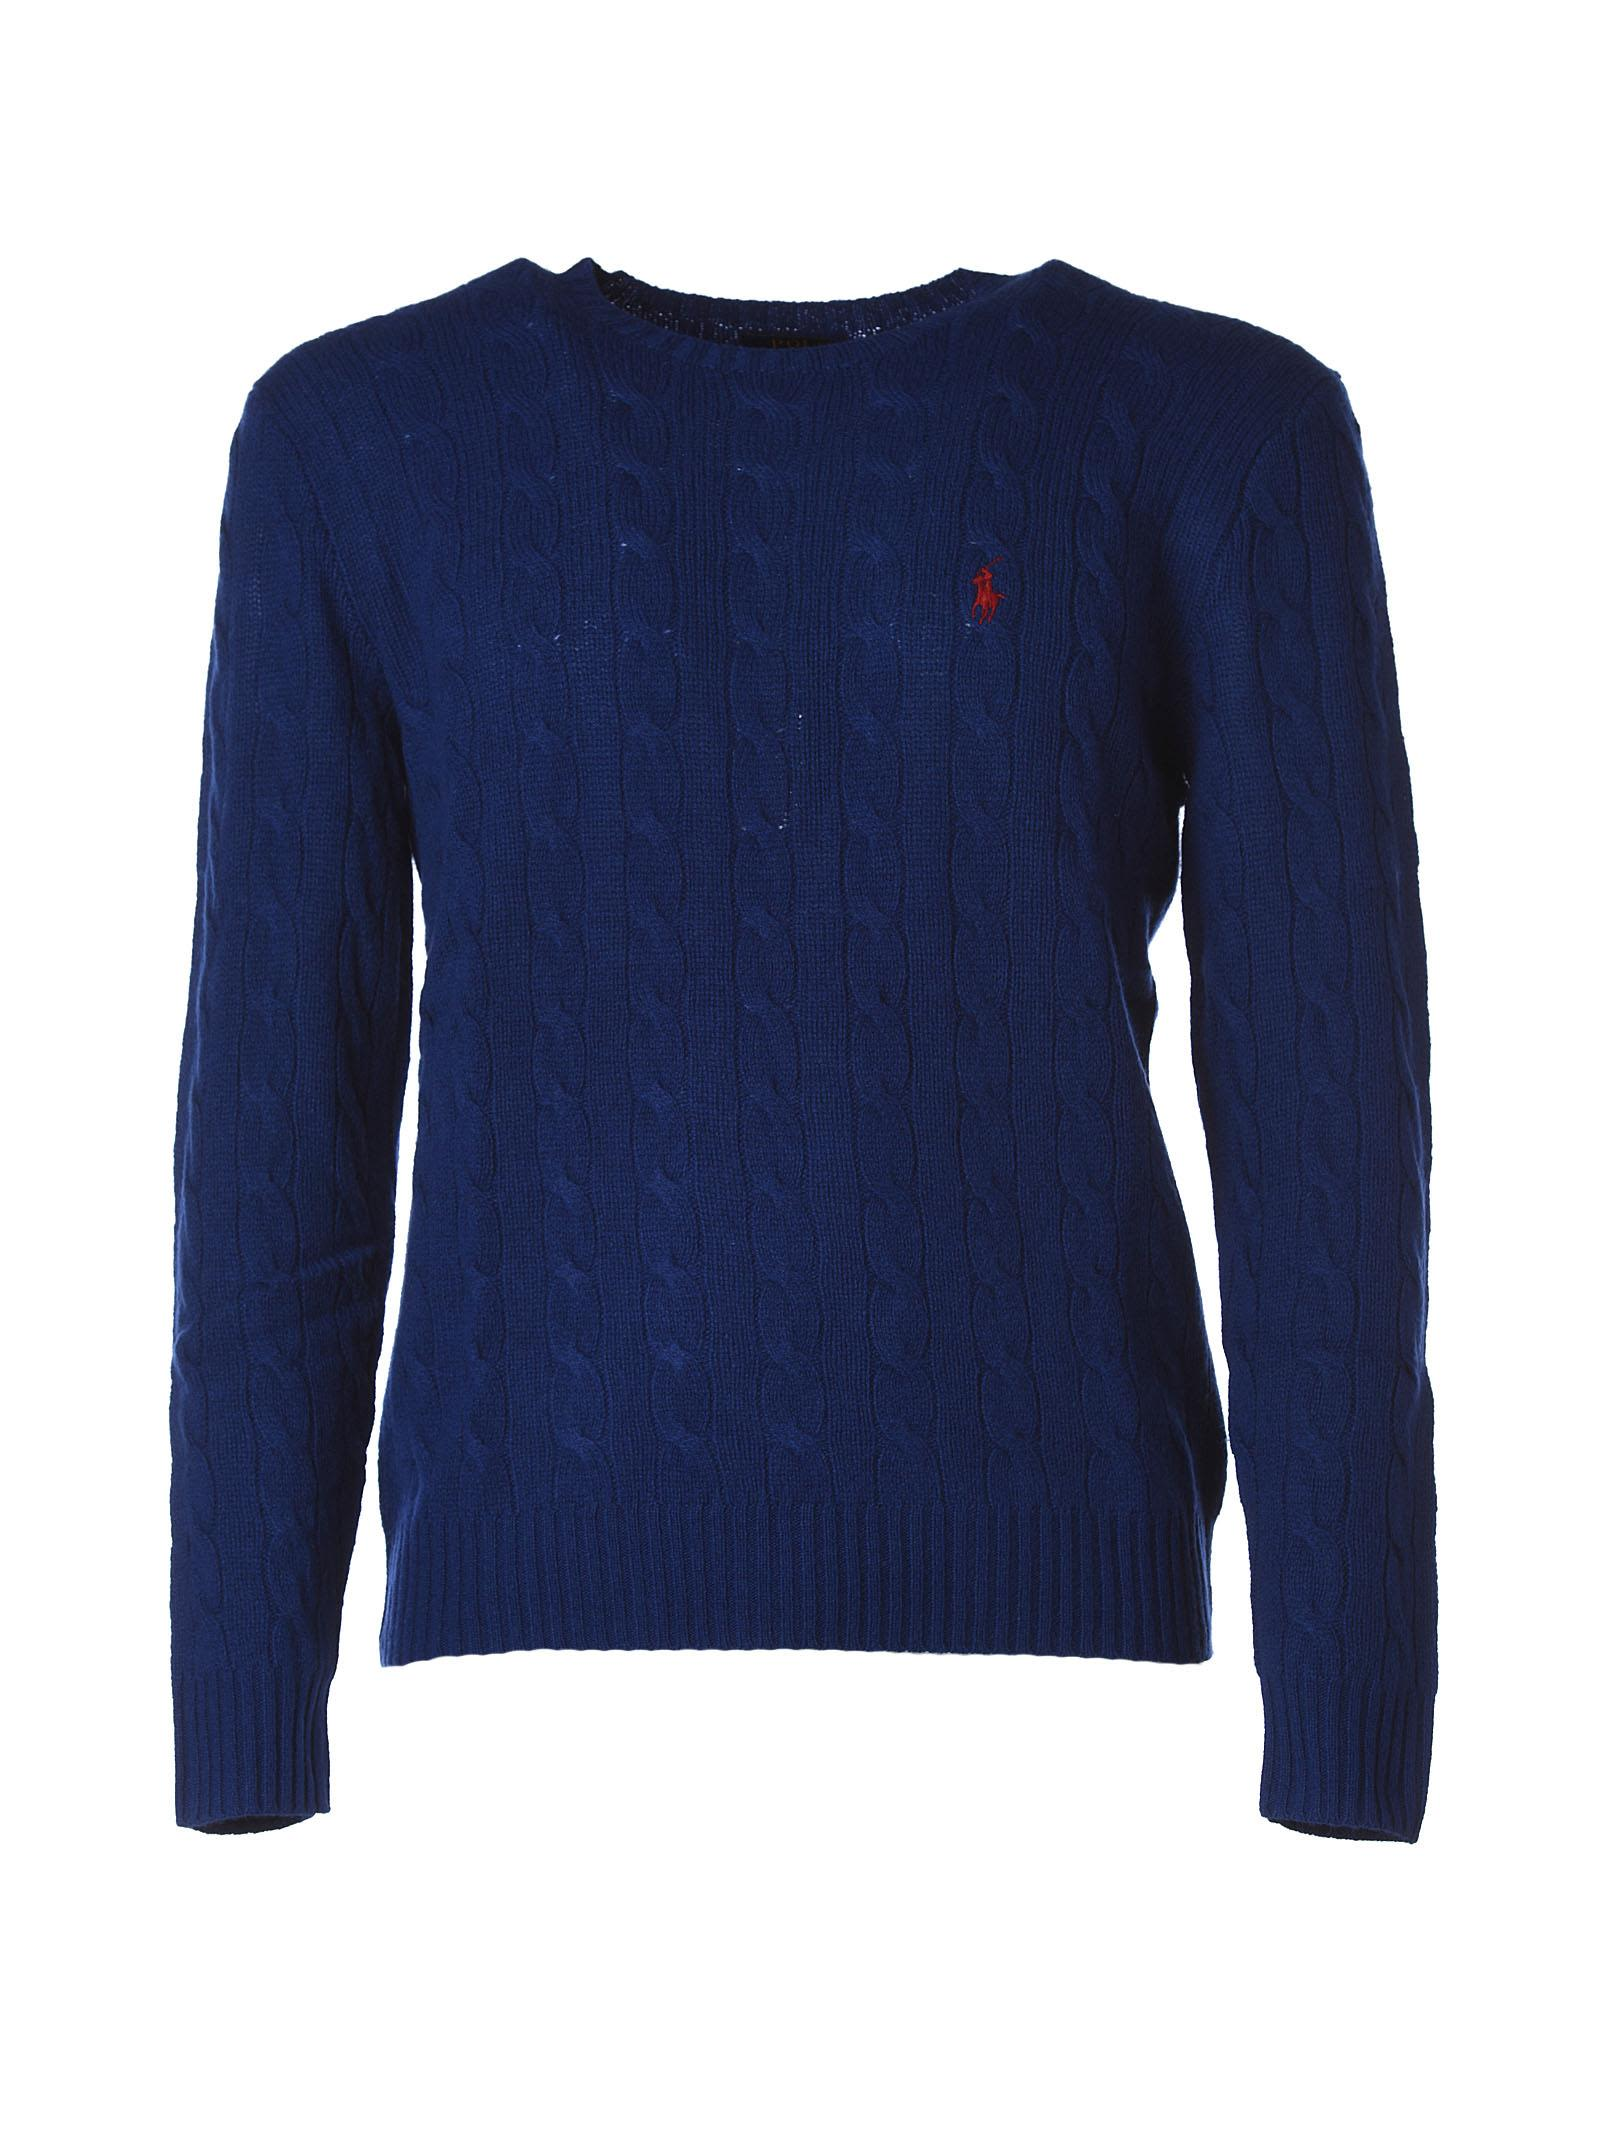 Polo Ralph Lauren Royal Blue Round Neck Sweater